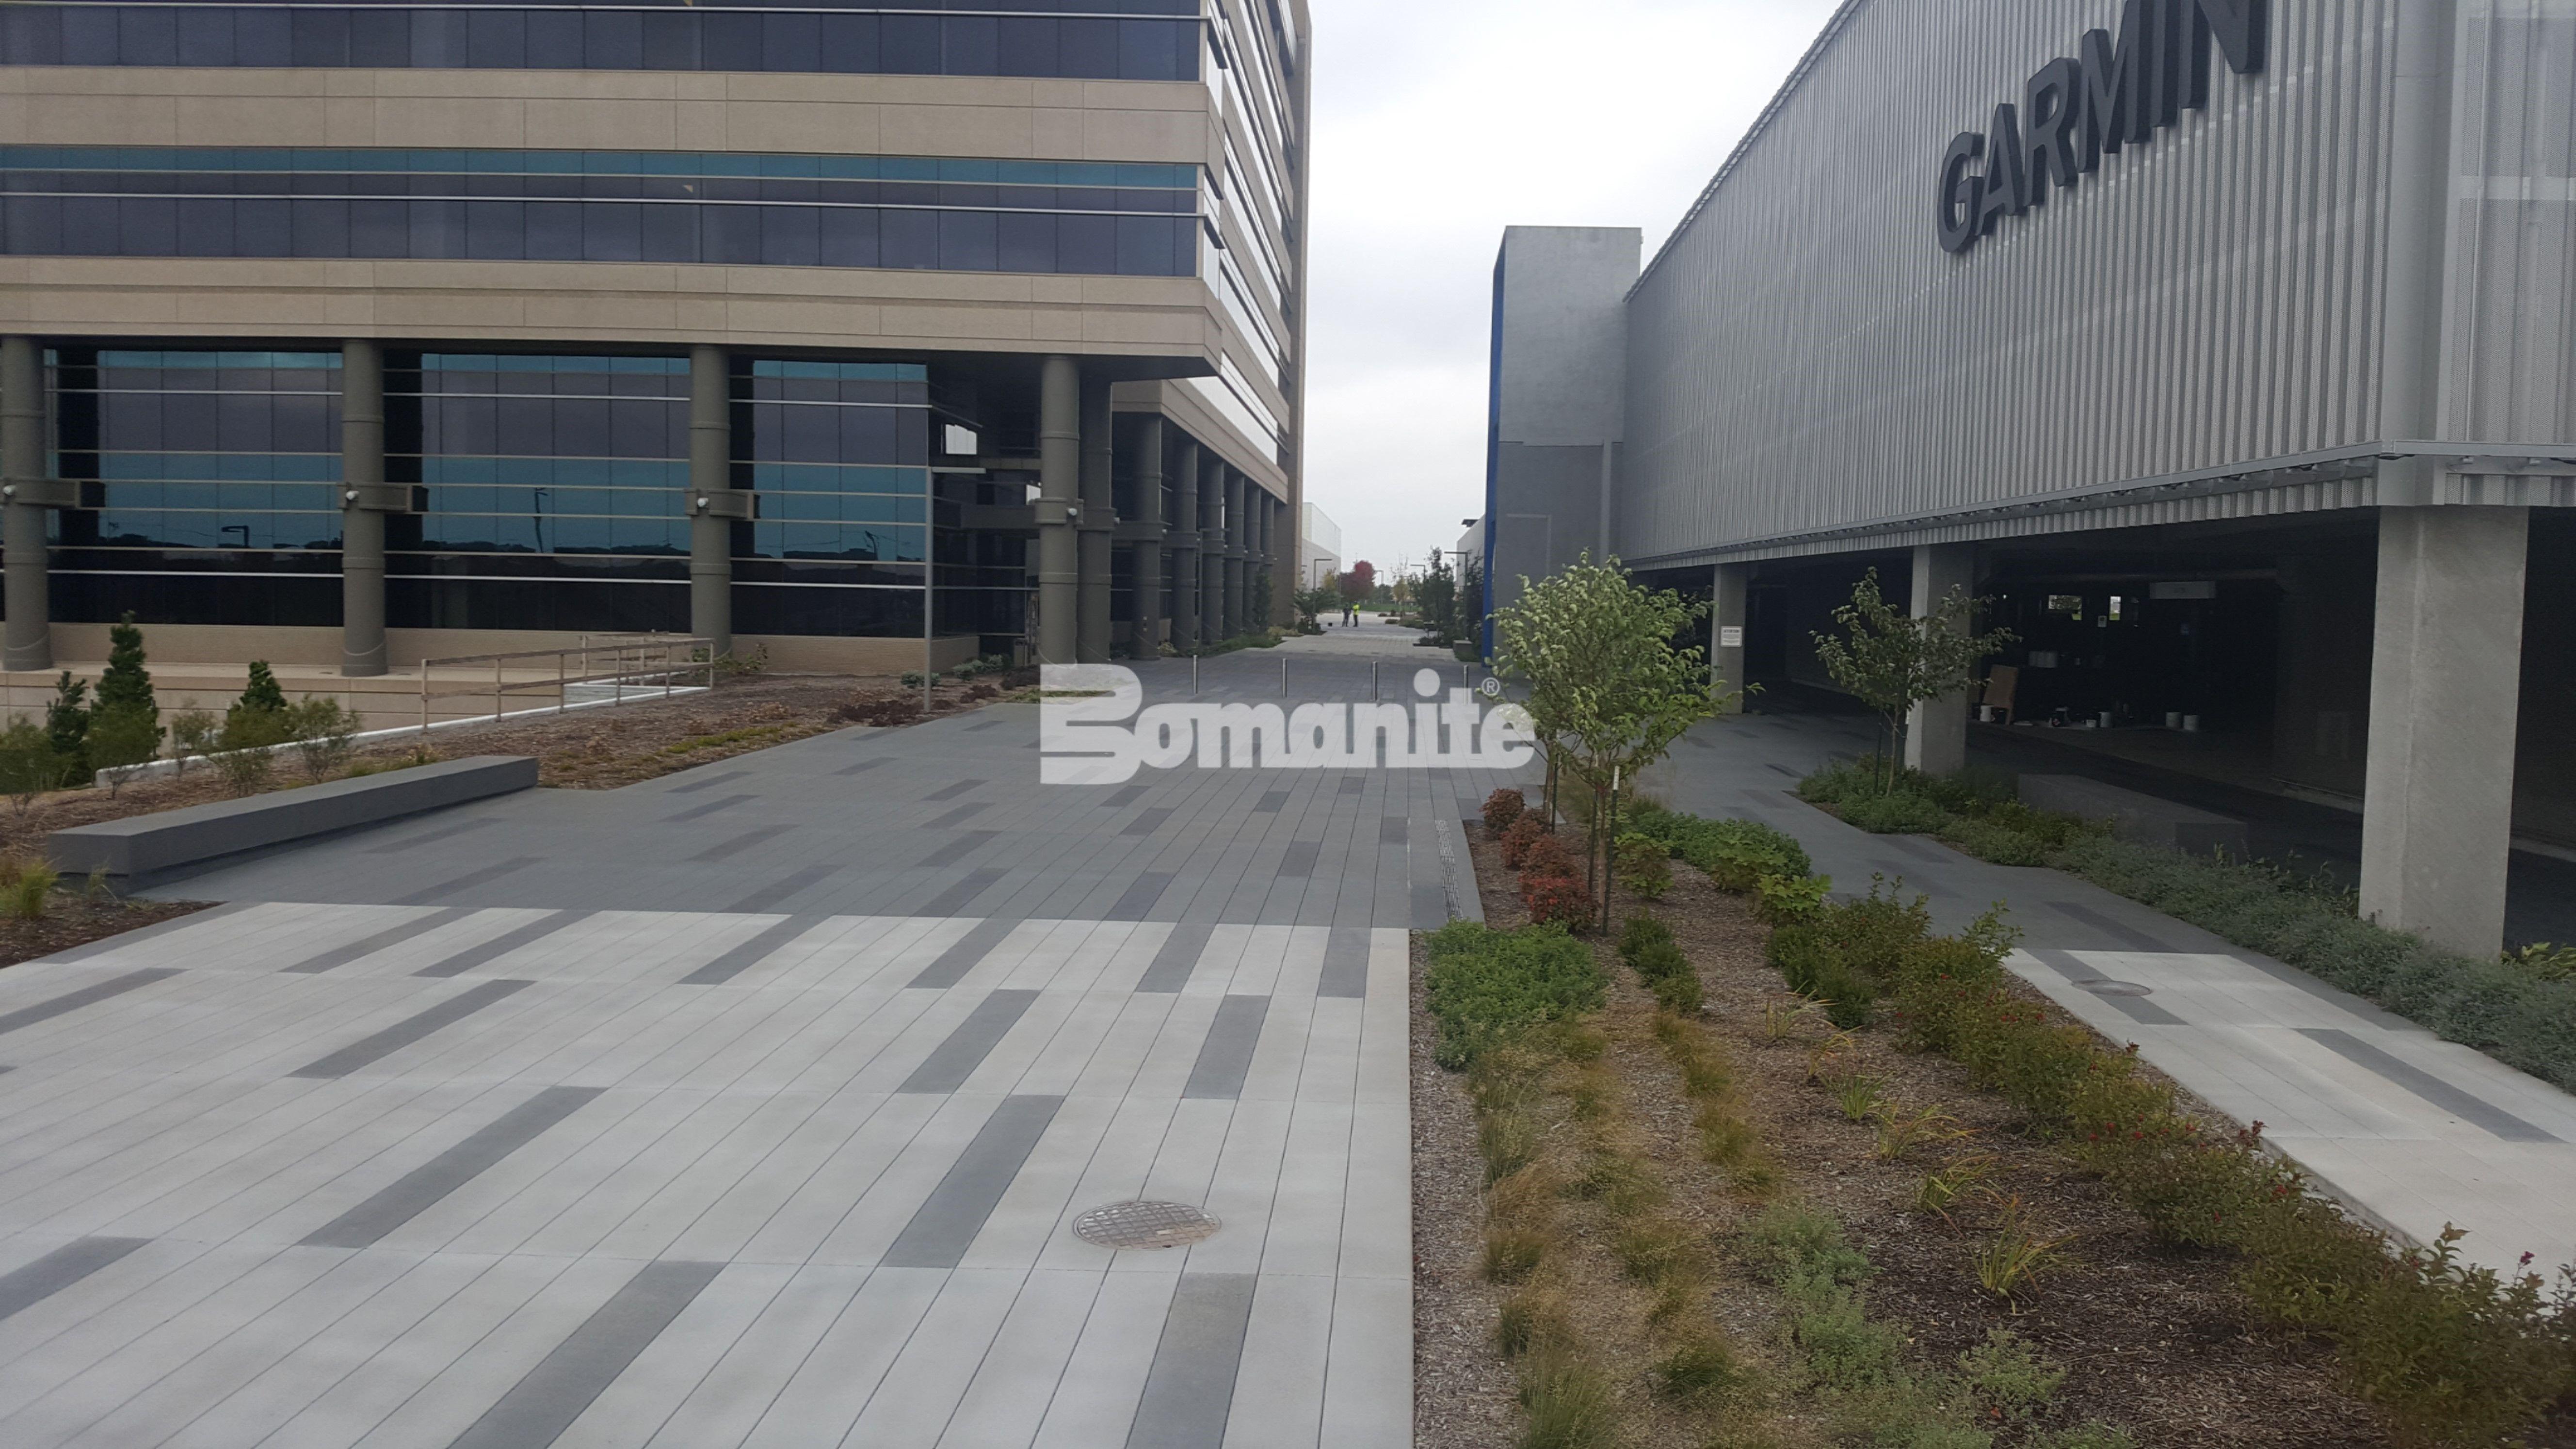 Bomanite Sandscape Texture at Garmin Expansion Pedestria Plaza in Olathe, KS